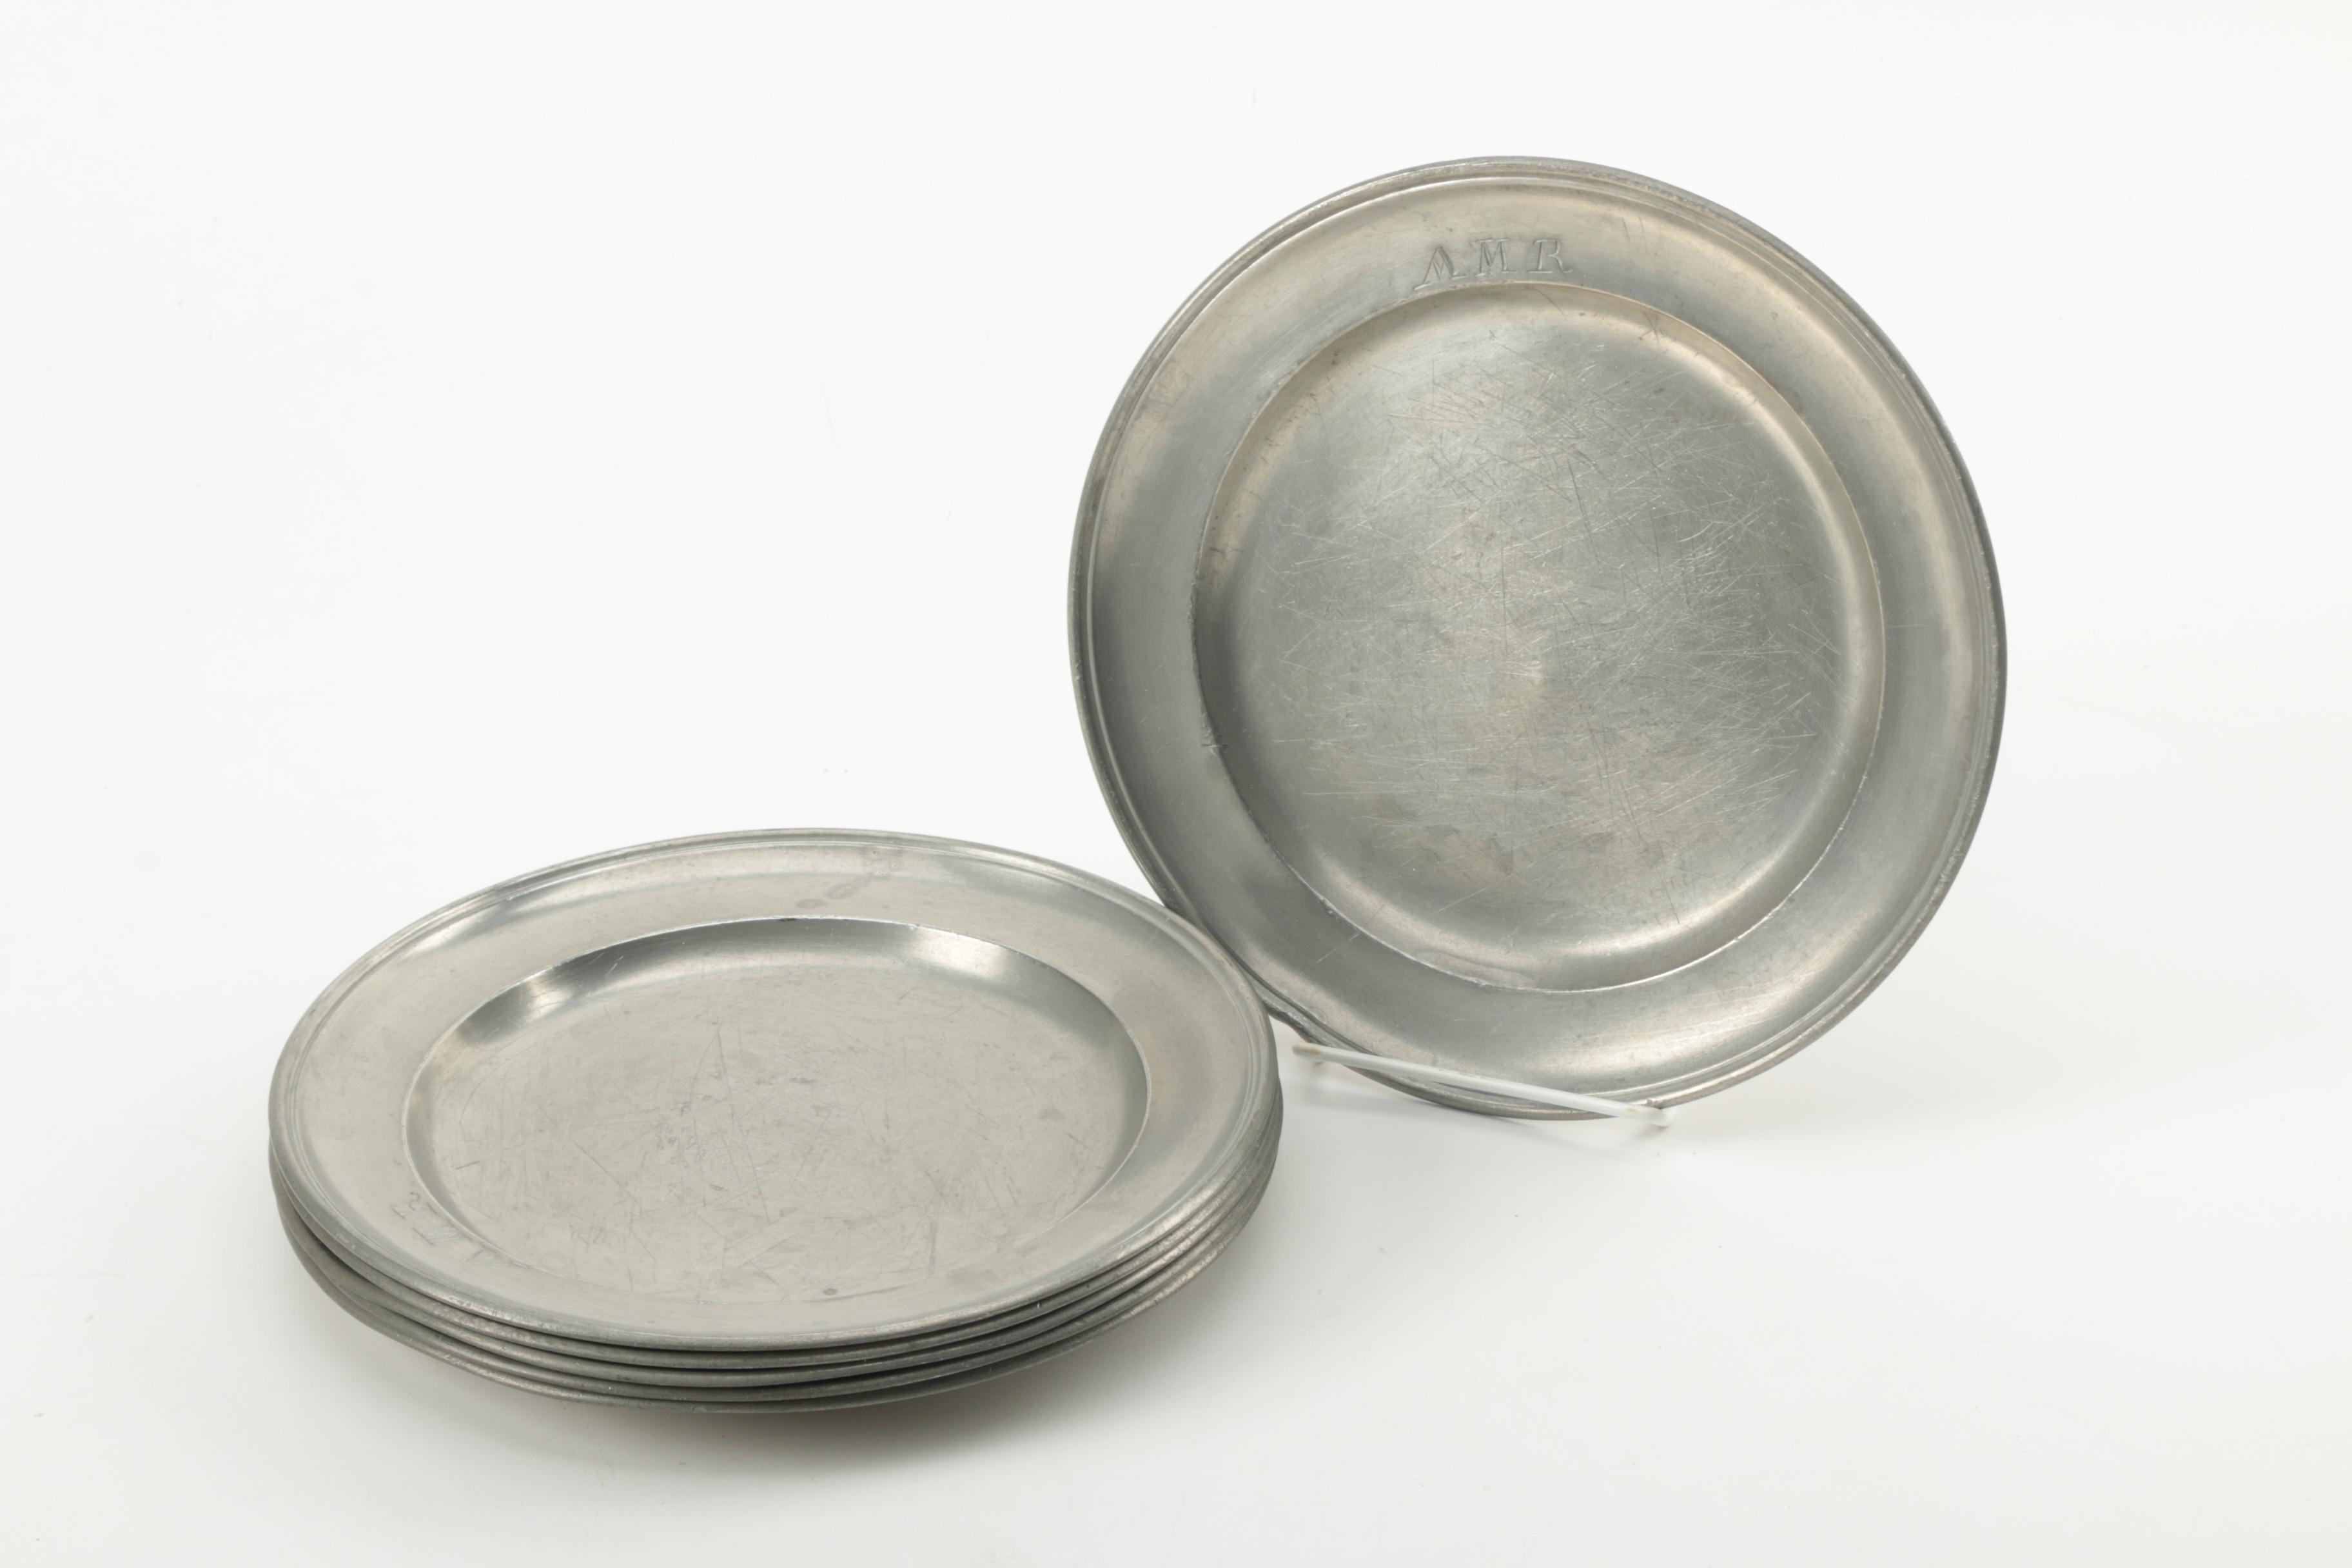 Set of Personally Engraved Pewter Dinner Plates ... & Set of Personally Engraved Pewter Dinner Plates : EBTH